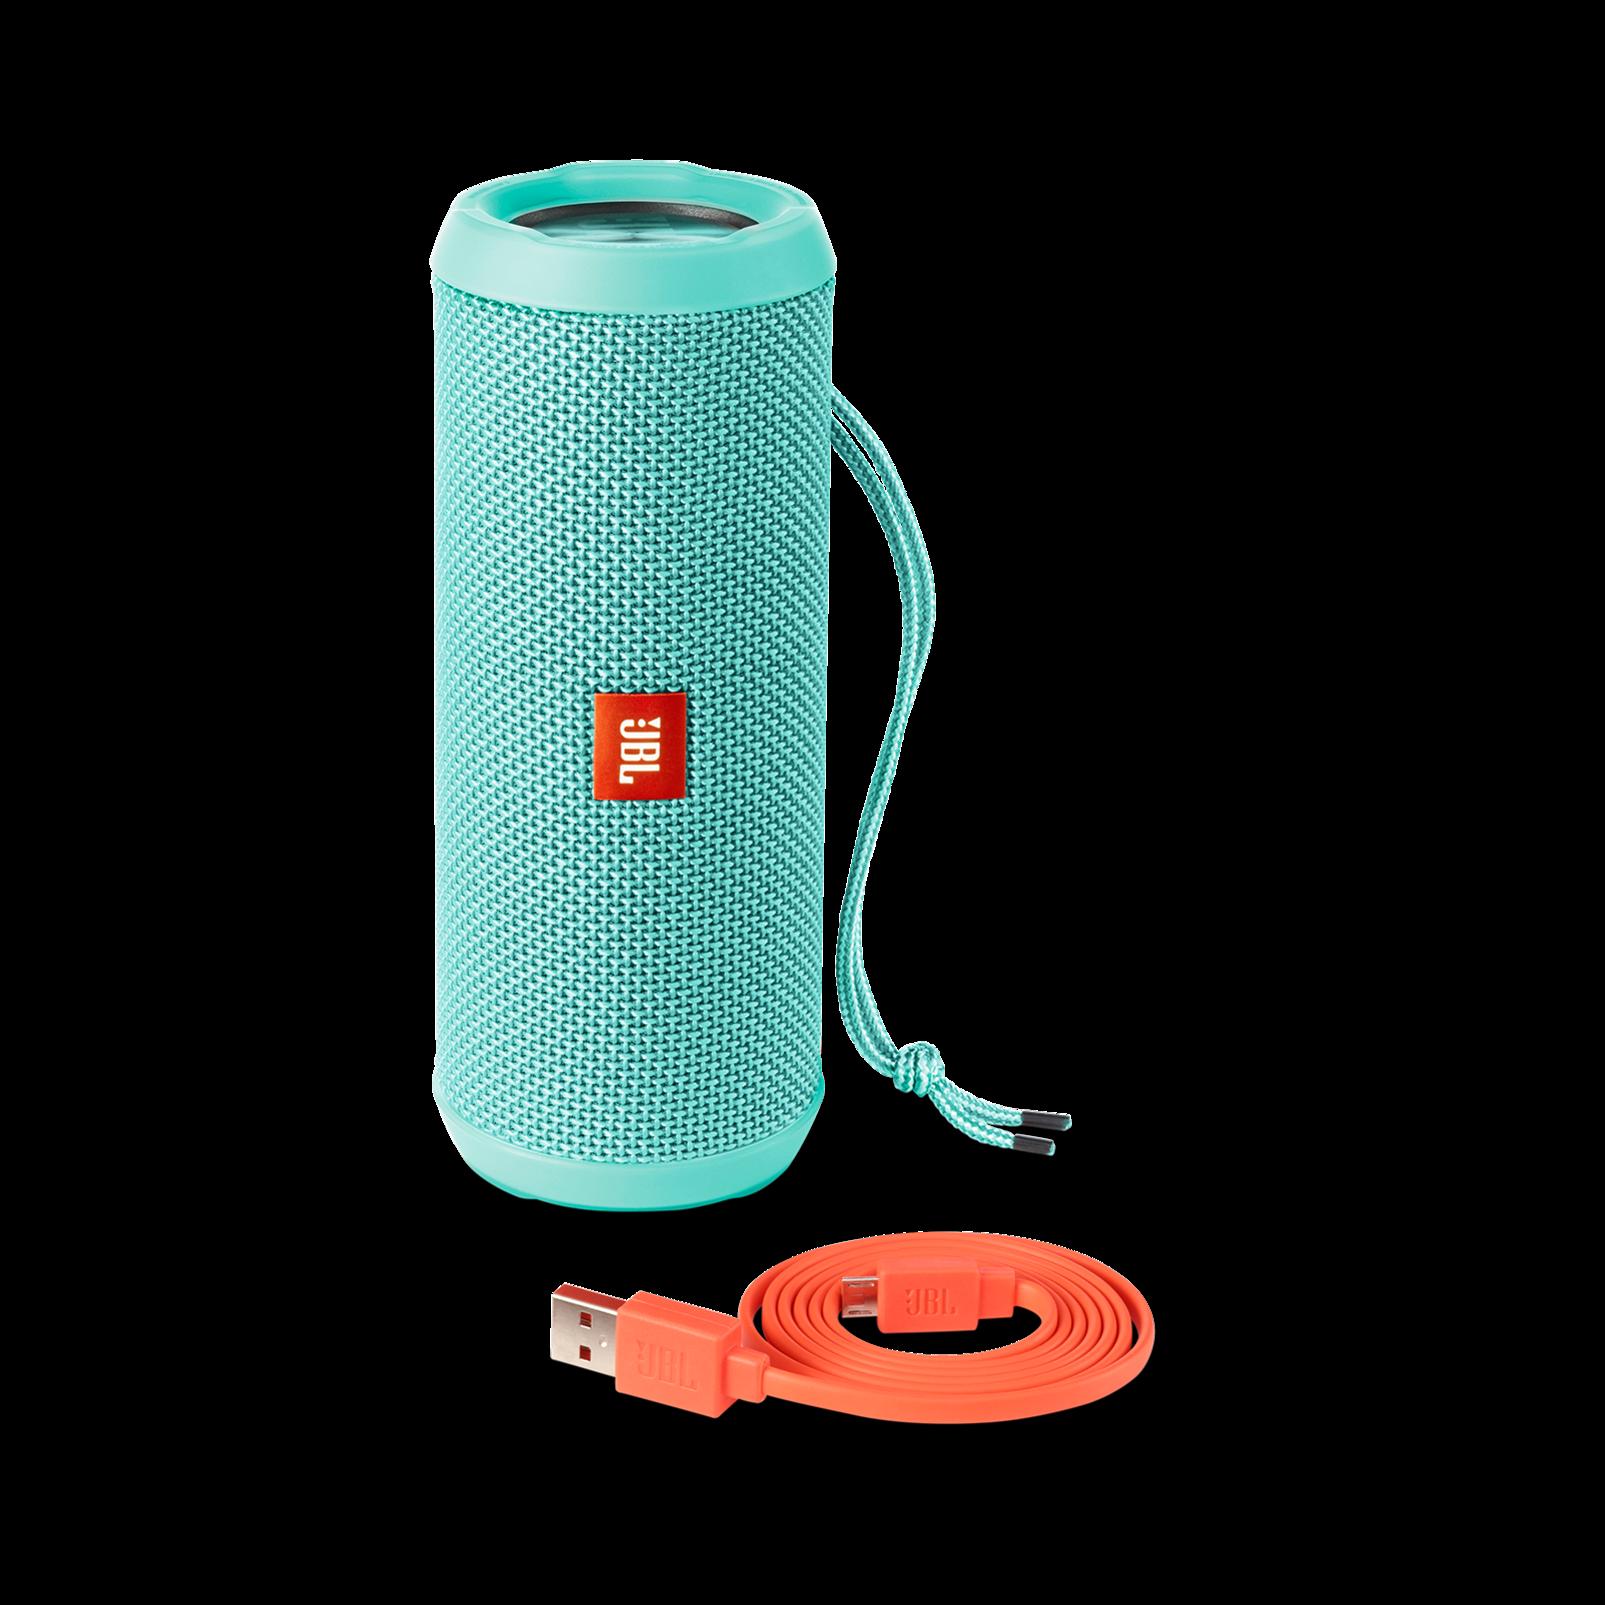 JBL Flip 3 - Teal - Splashproof portable Bluetooth speaker with powerful sound and speakerphone technology - Detailshot 4